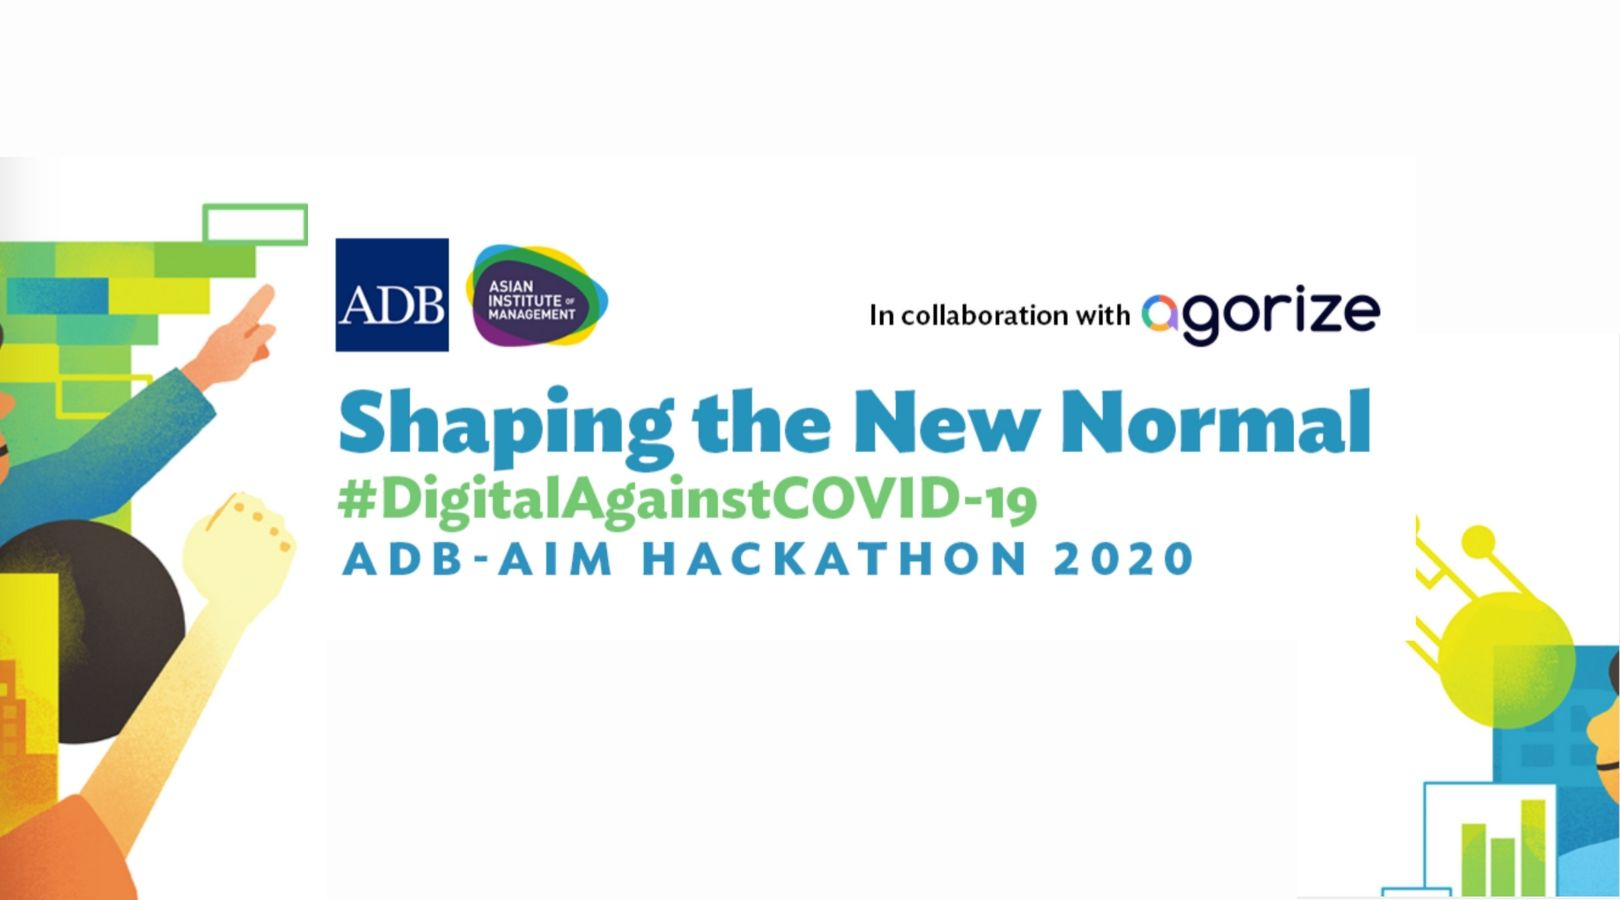 #DigitalAgainstCOVID-19 ADB-AIM Hackathon 2020 for Asians (Win up to $10,000)